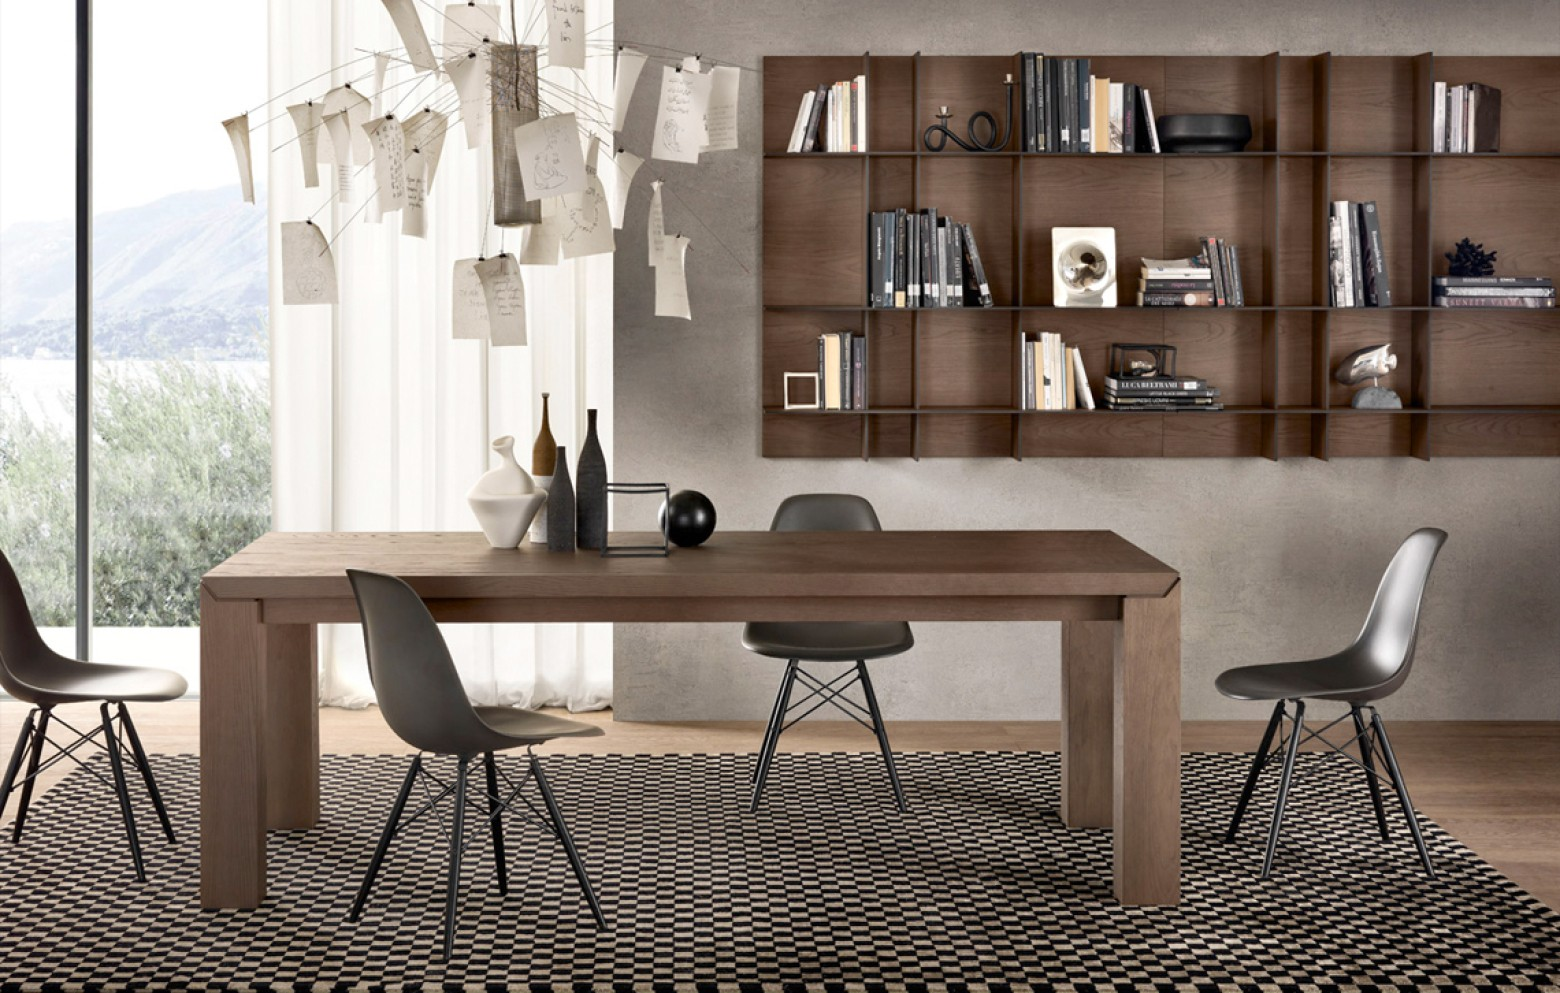 ambrogio esstische tische st hle who 39 s perfect. Black Bedroom Furniture Sets. Home Design Ideas